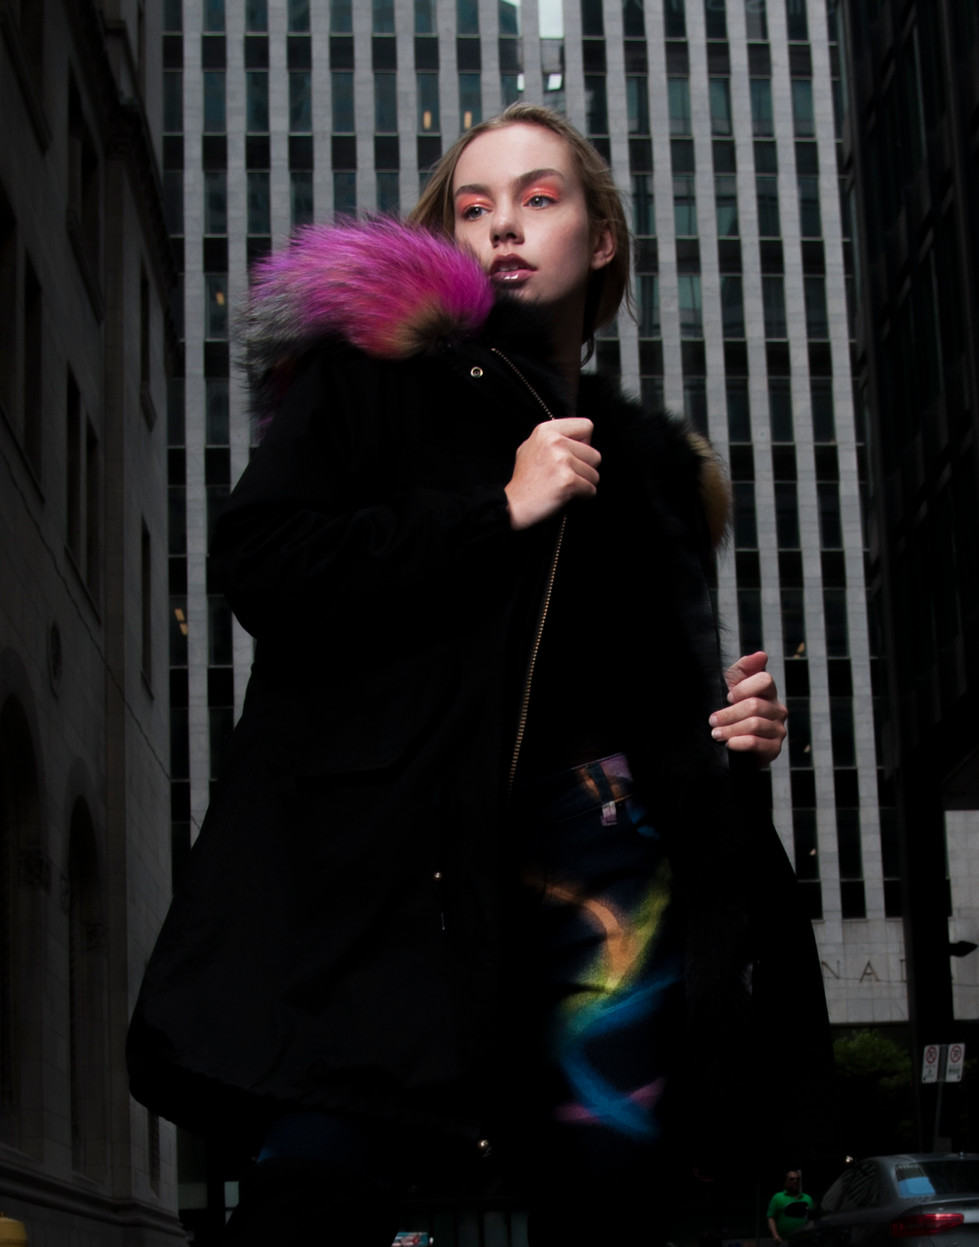 MODEL: CAITLAIN MUA: @PINCHCOSMETICS PHOTOGRAPHY: DAVE HYNES